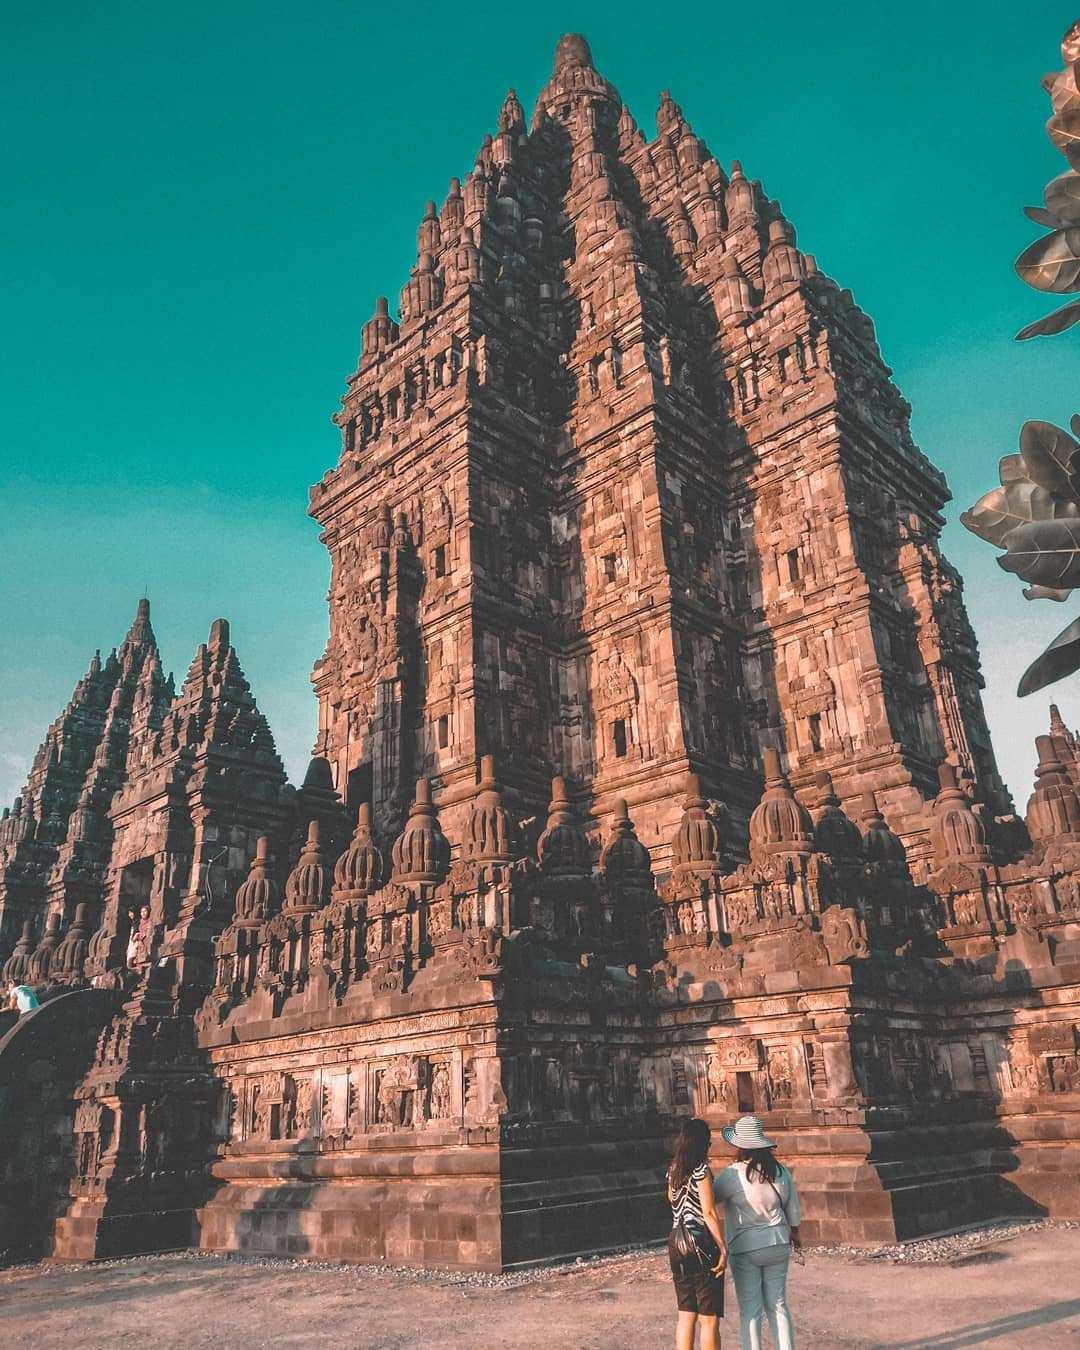 Salah Satu Candi Terbesar di Candi Prambanan, Image From @fuzizuf